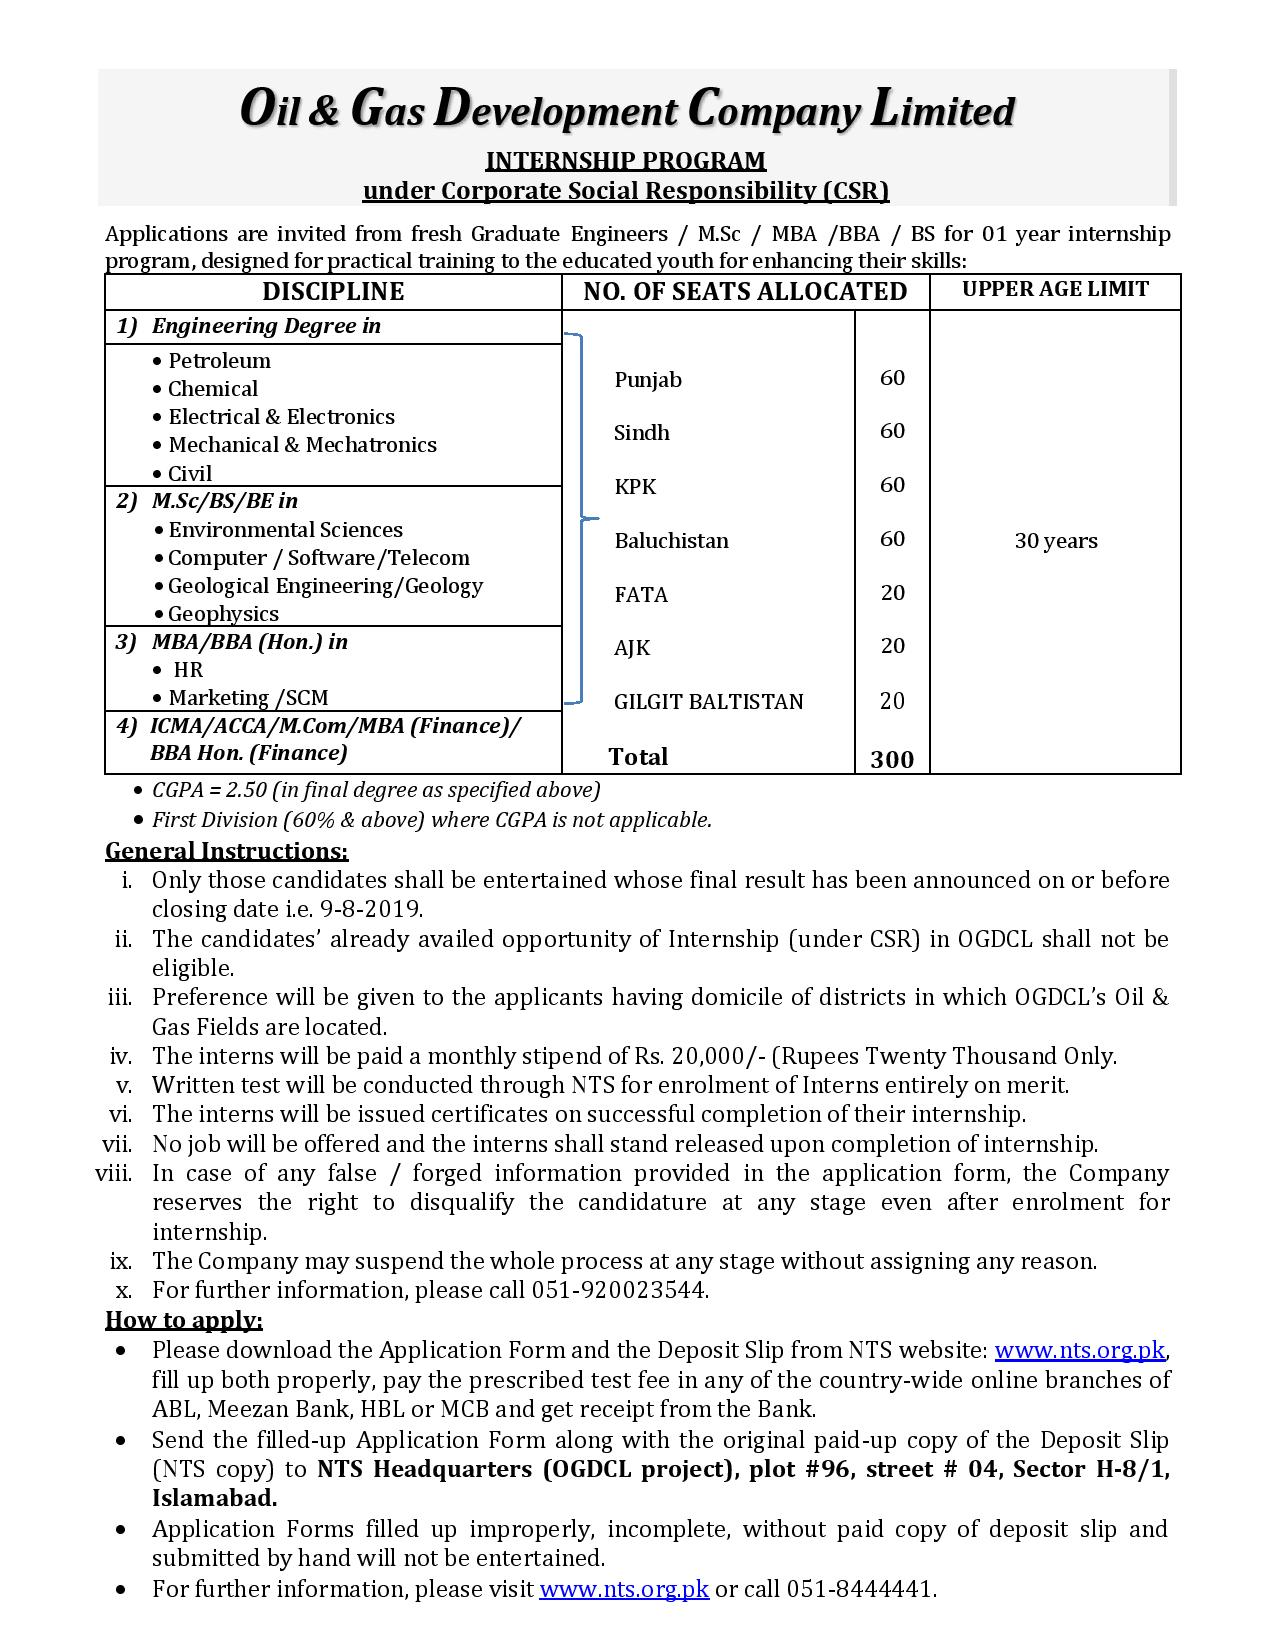 Oil Gas Development Company Limited OGDCL Internship Program NTS Test Roll No Slip